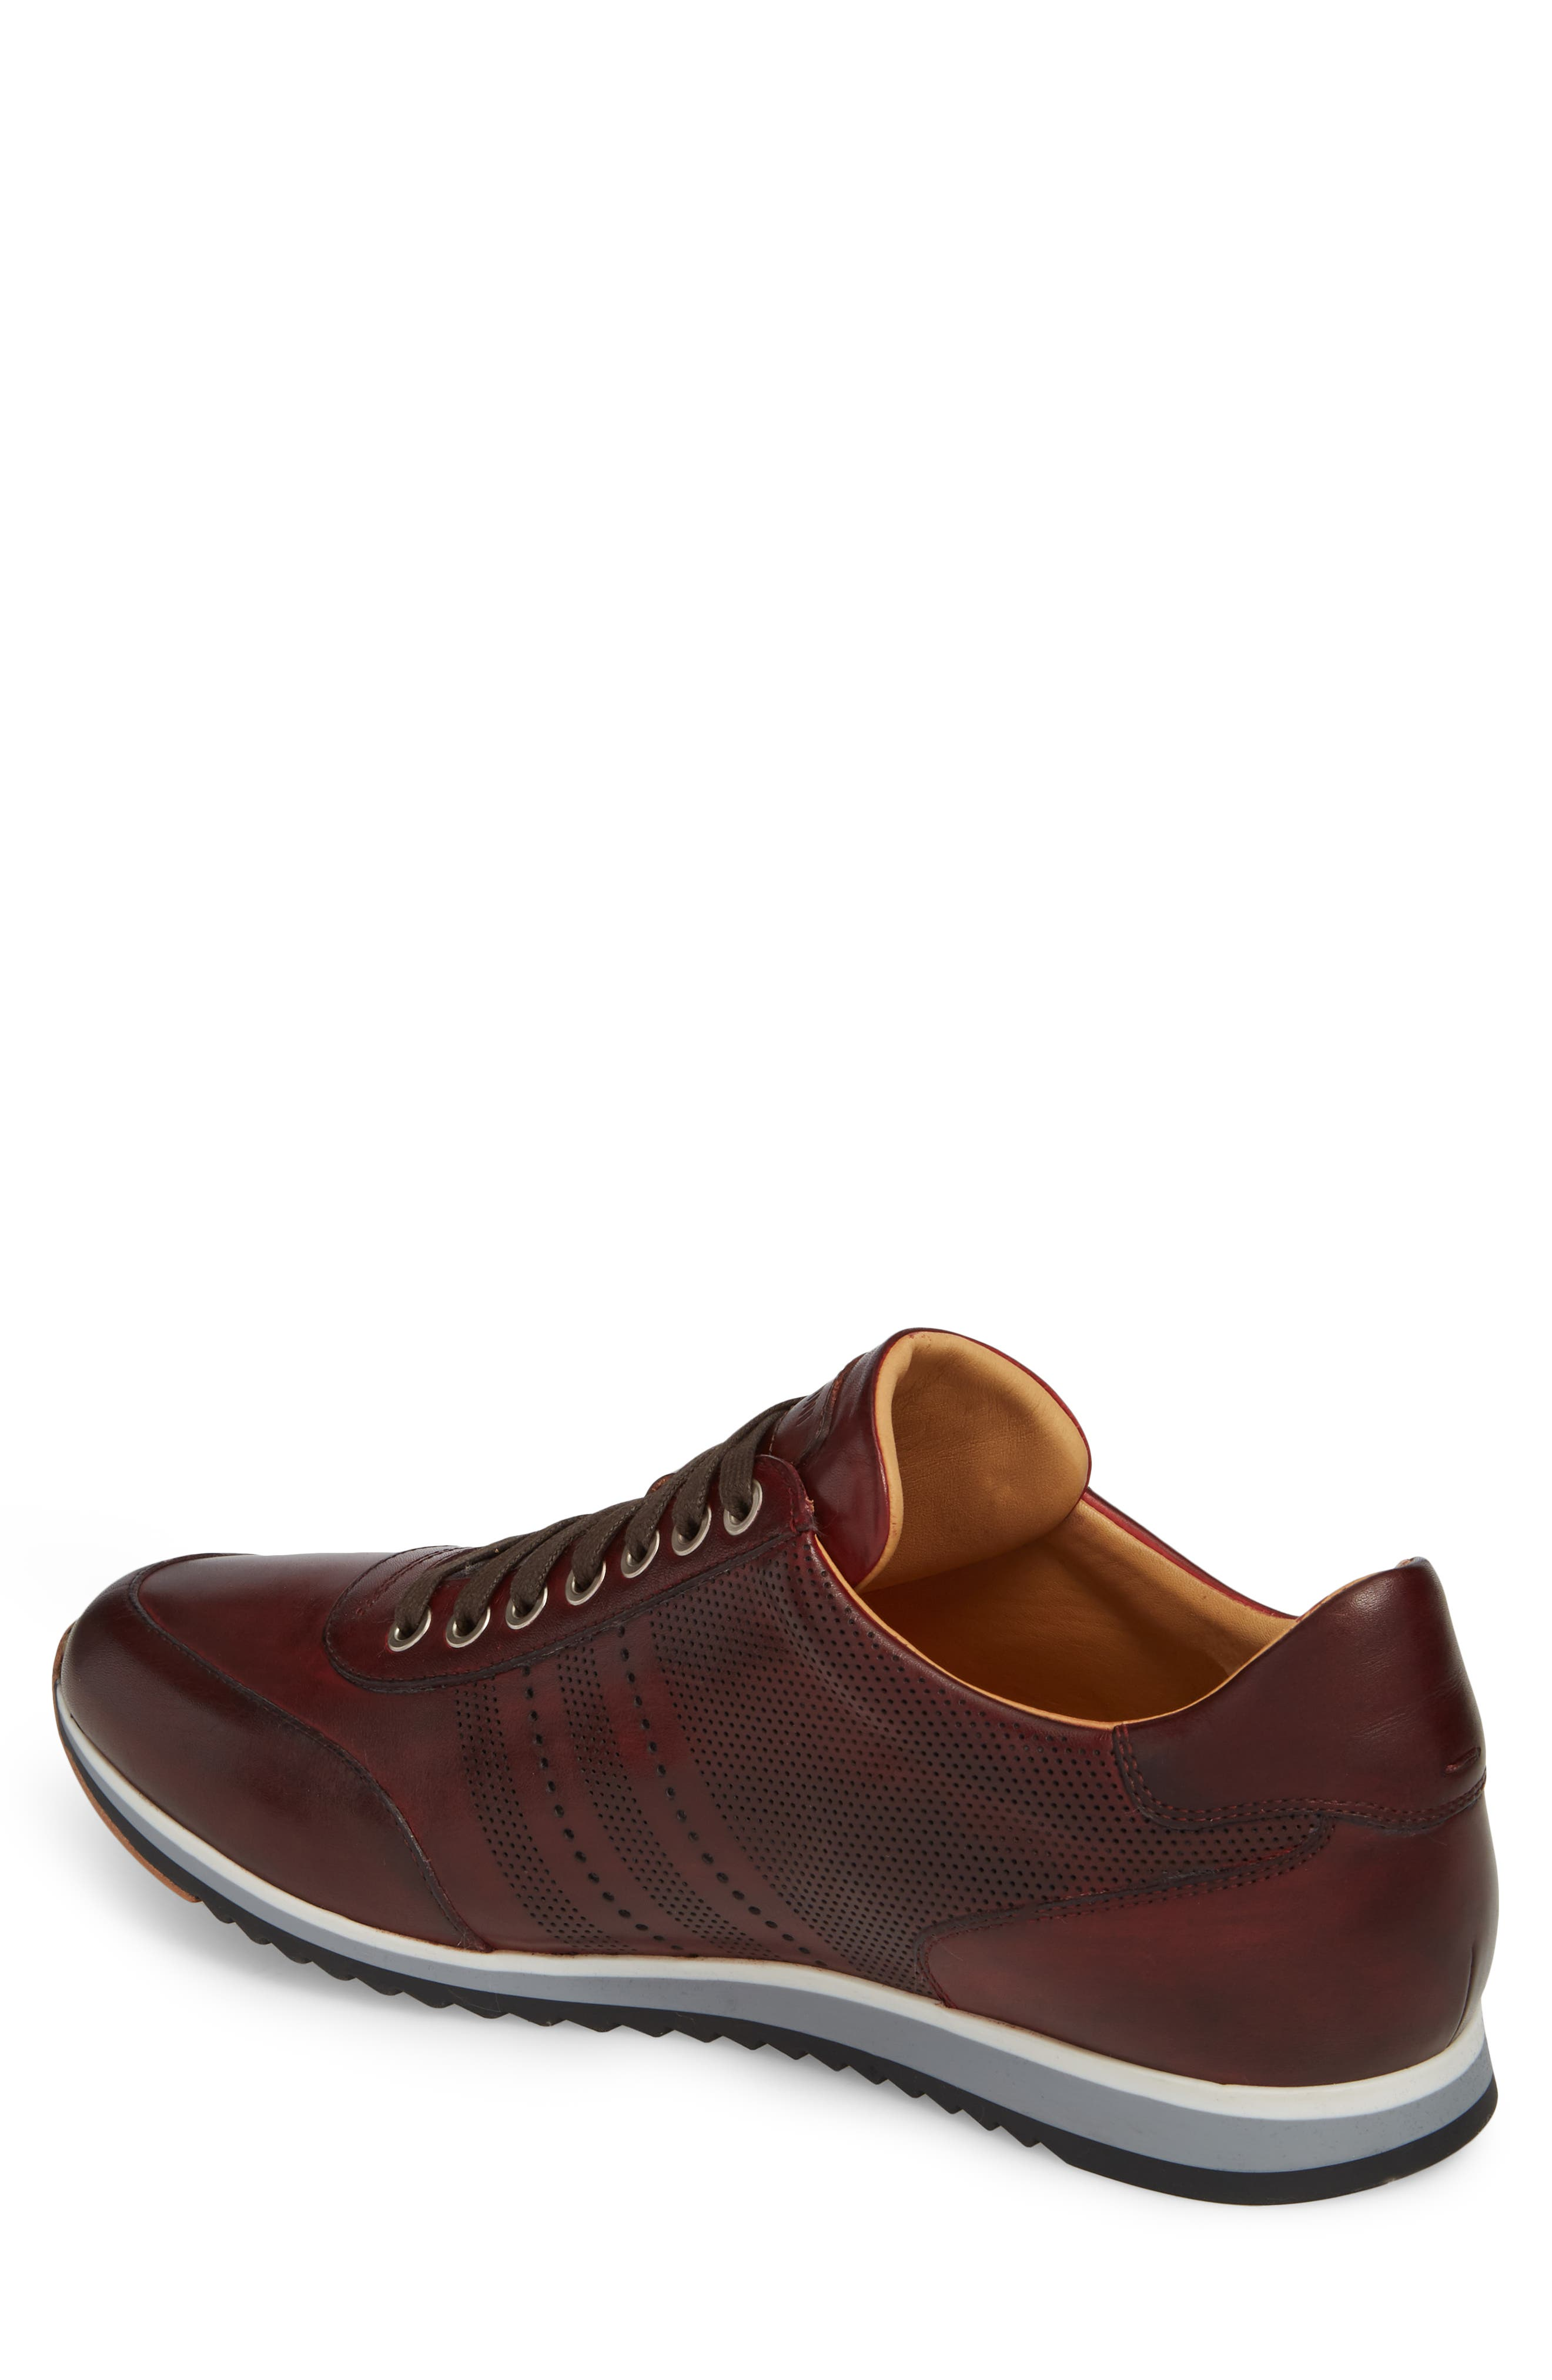 Alternate Image 2  - Magnanni Merino Sneaker (Men)